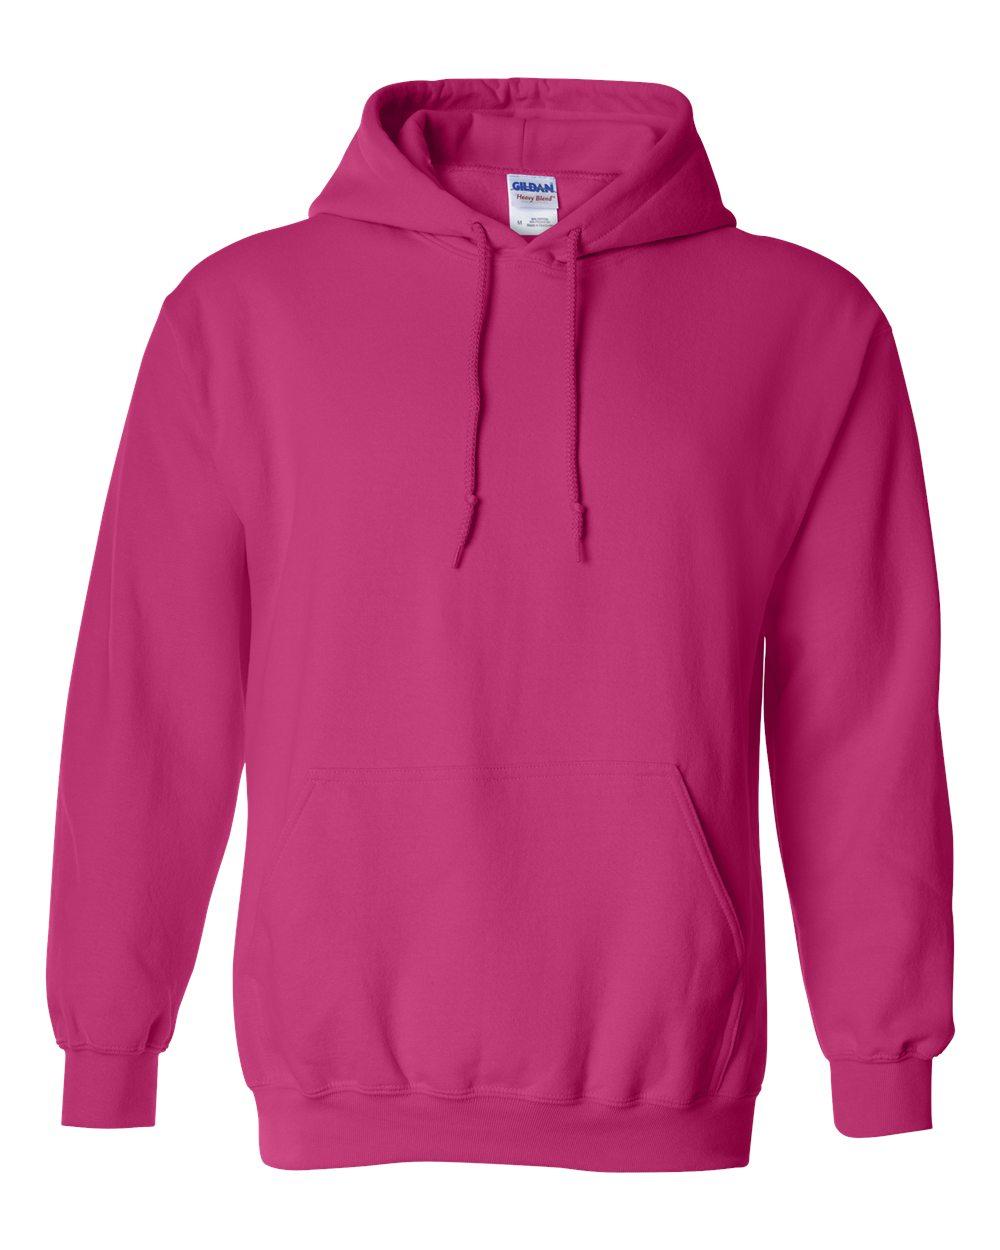 Gildan-Mens-Blank-Hoodie-Heavy-Blend-Hooded-Sweatshirt-Solid-18500-up-to-5XL thumbnail 36